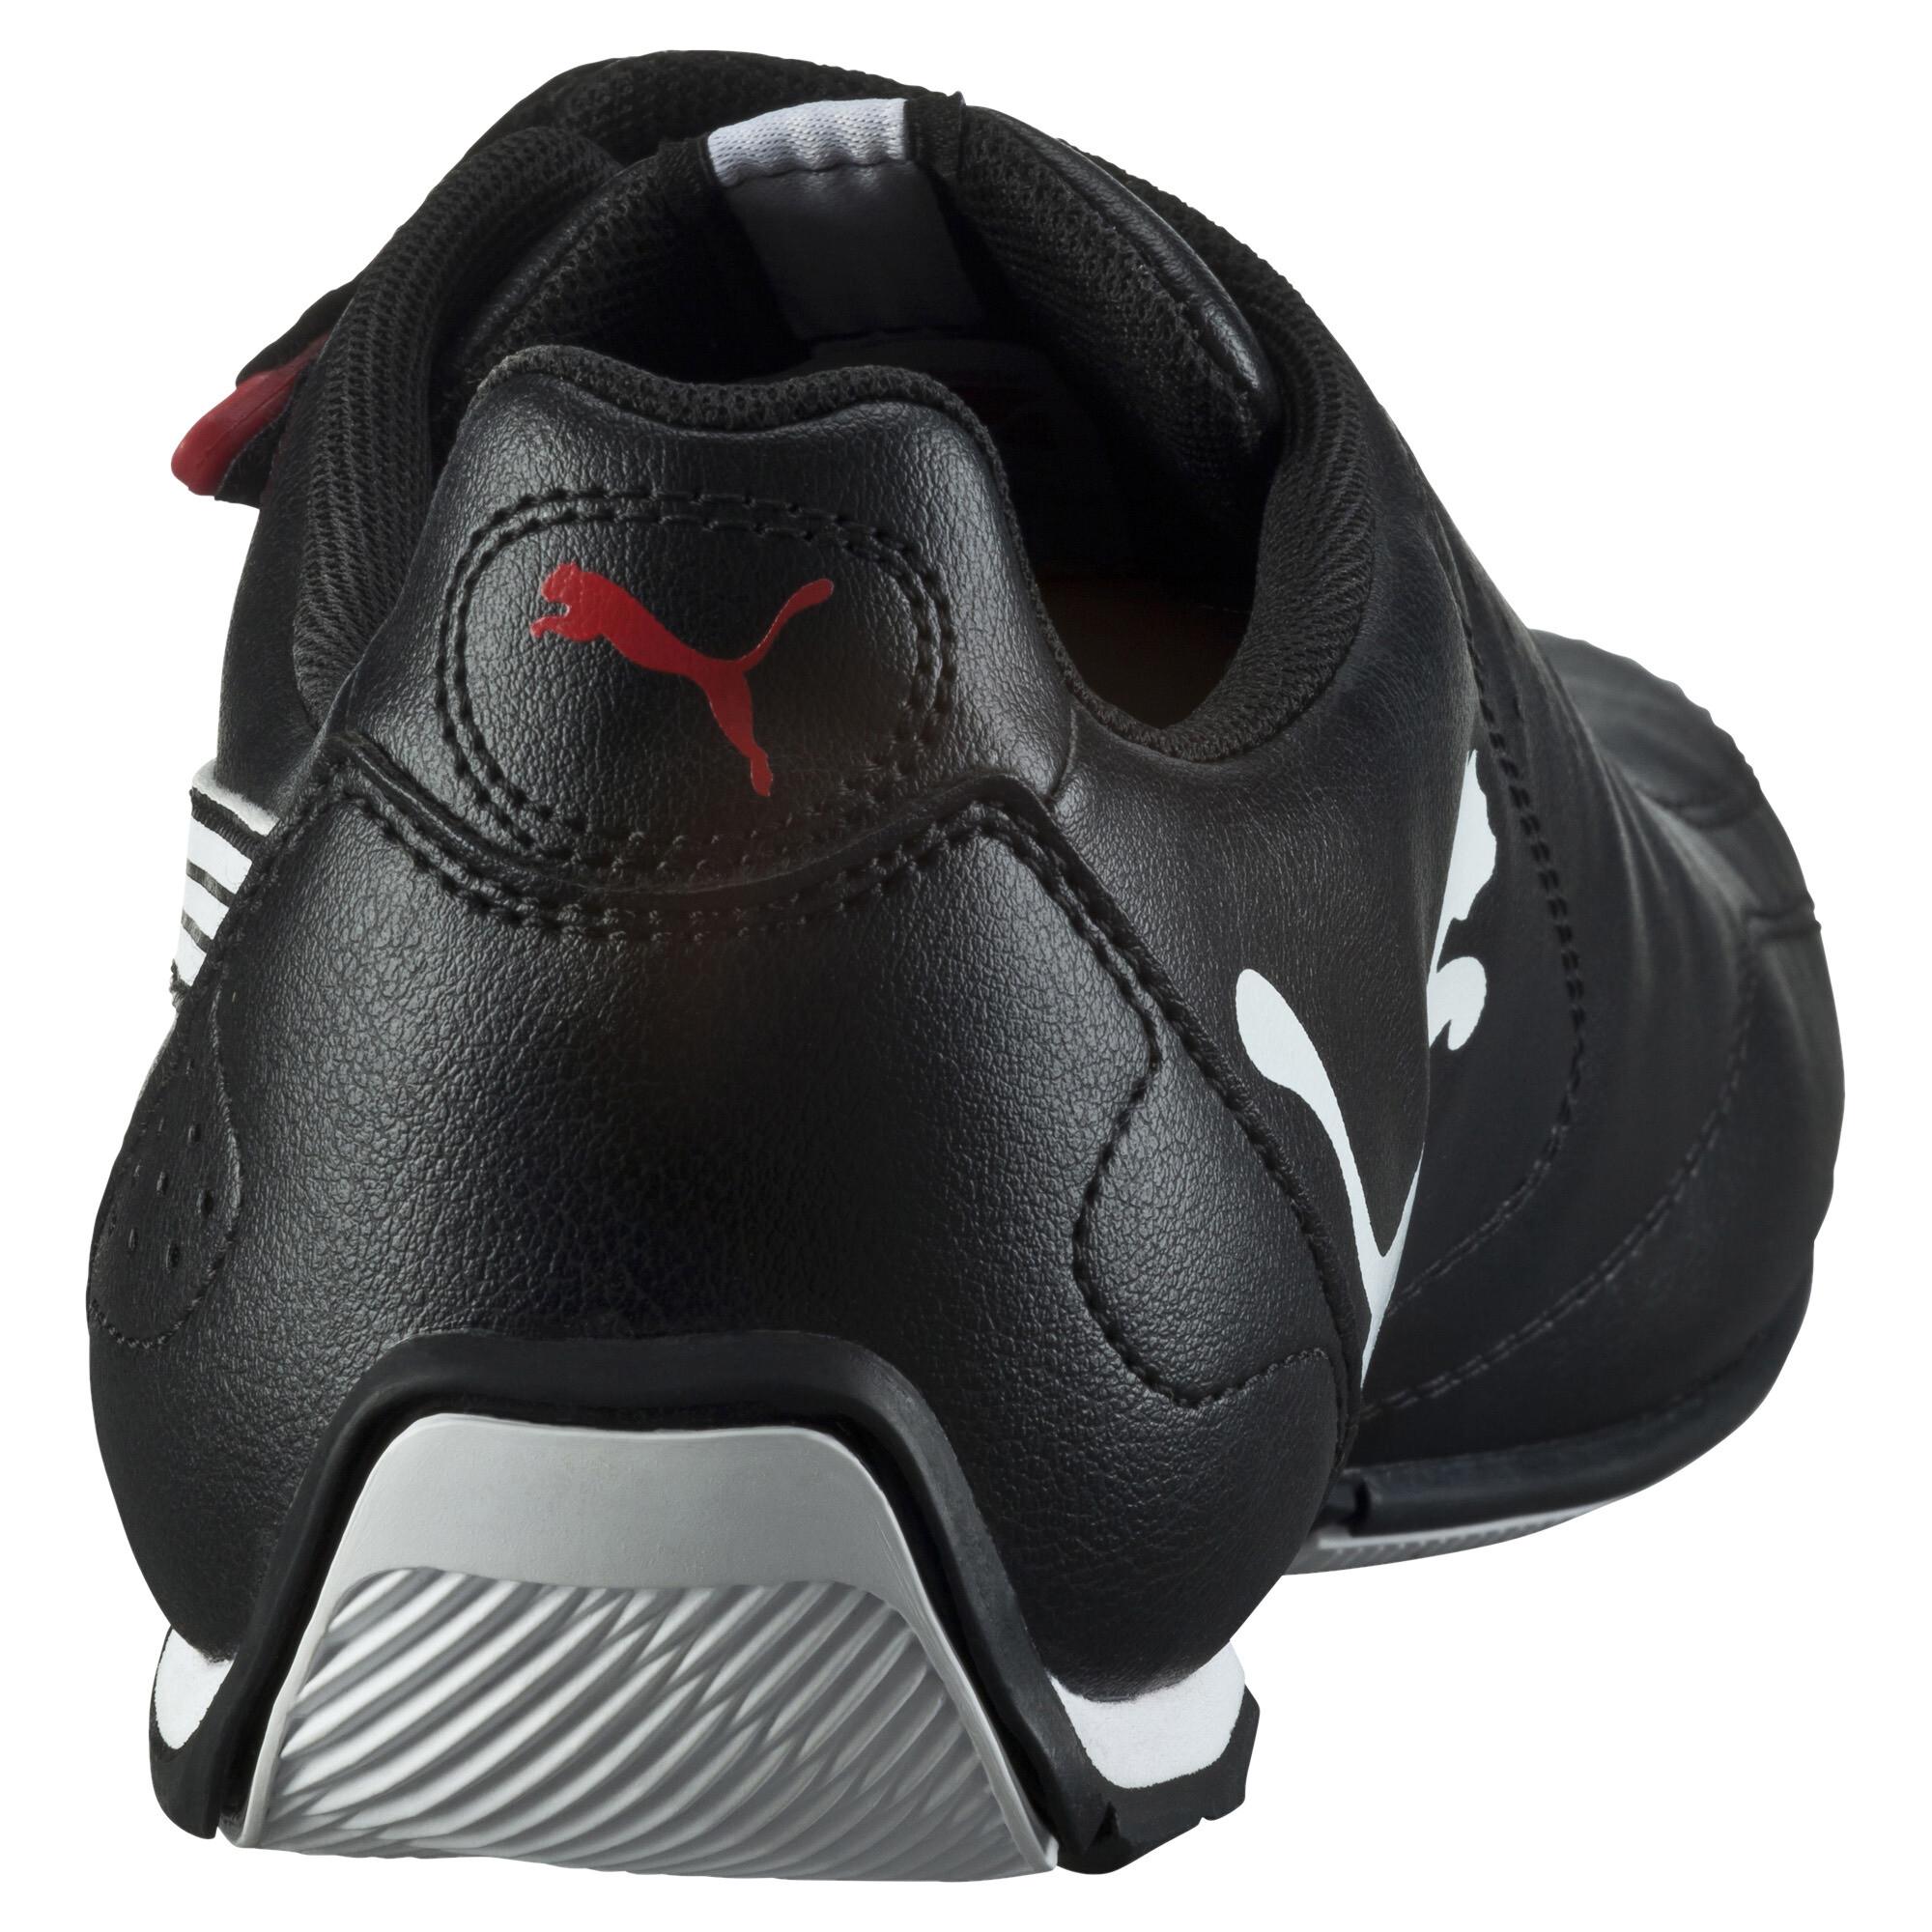 miniature 8 - Puma Men's Redon Move Shoes